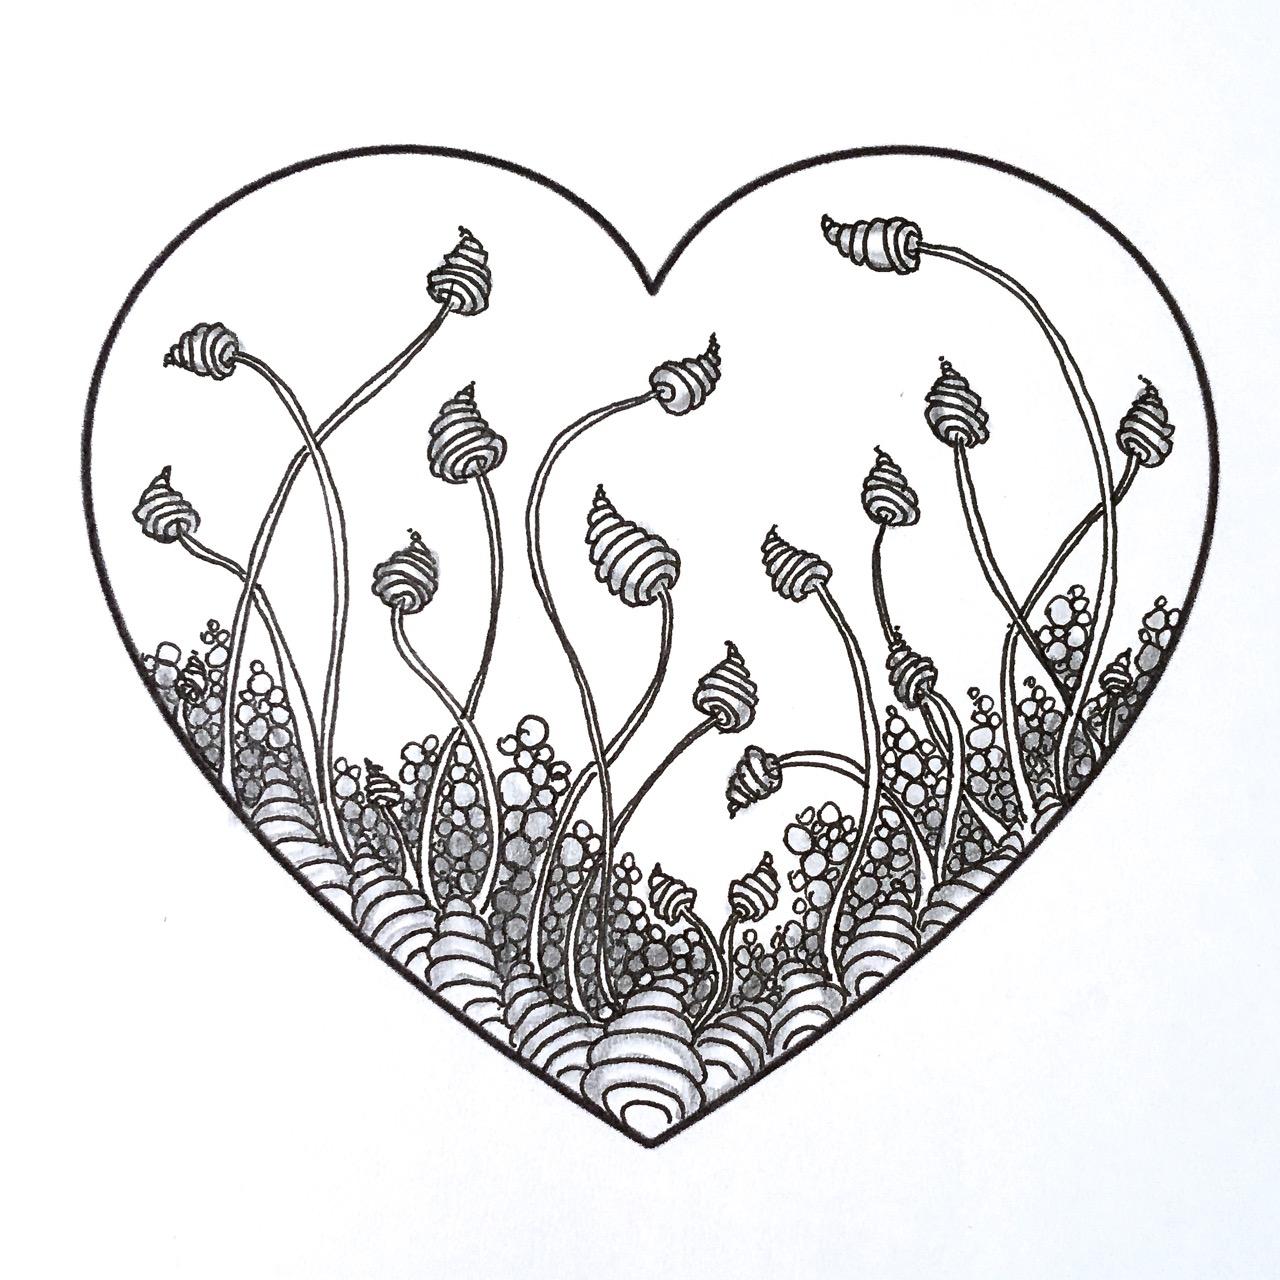 1280x1280 Zentangle Valentine's Heart Series Designs 2016 Always Choose